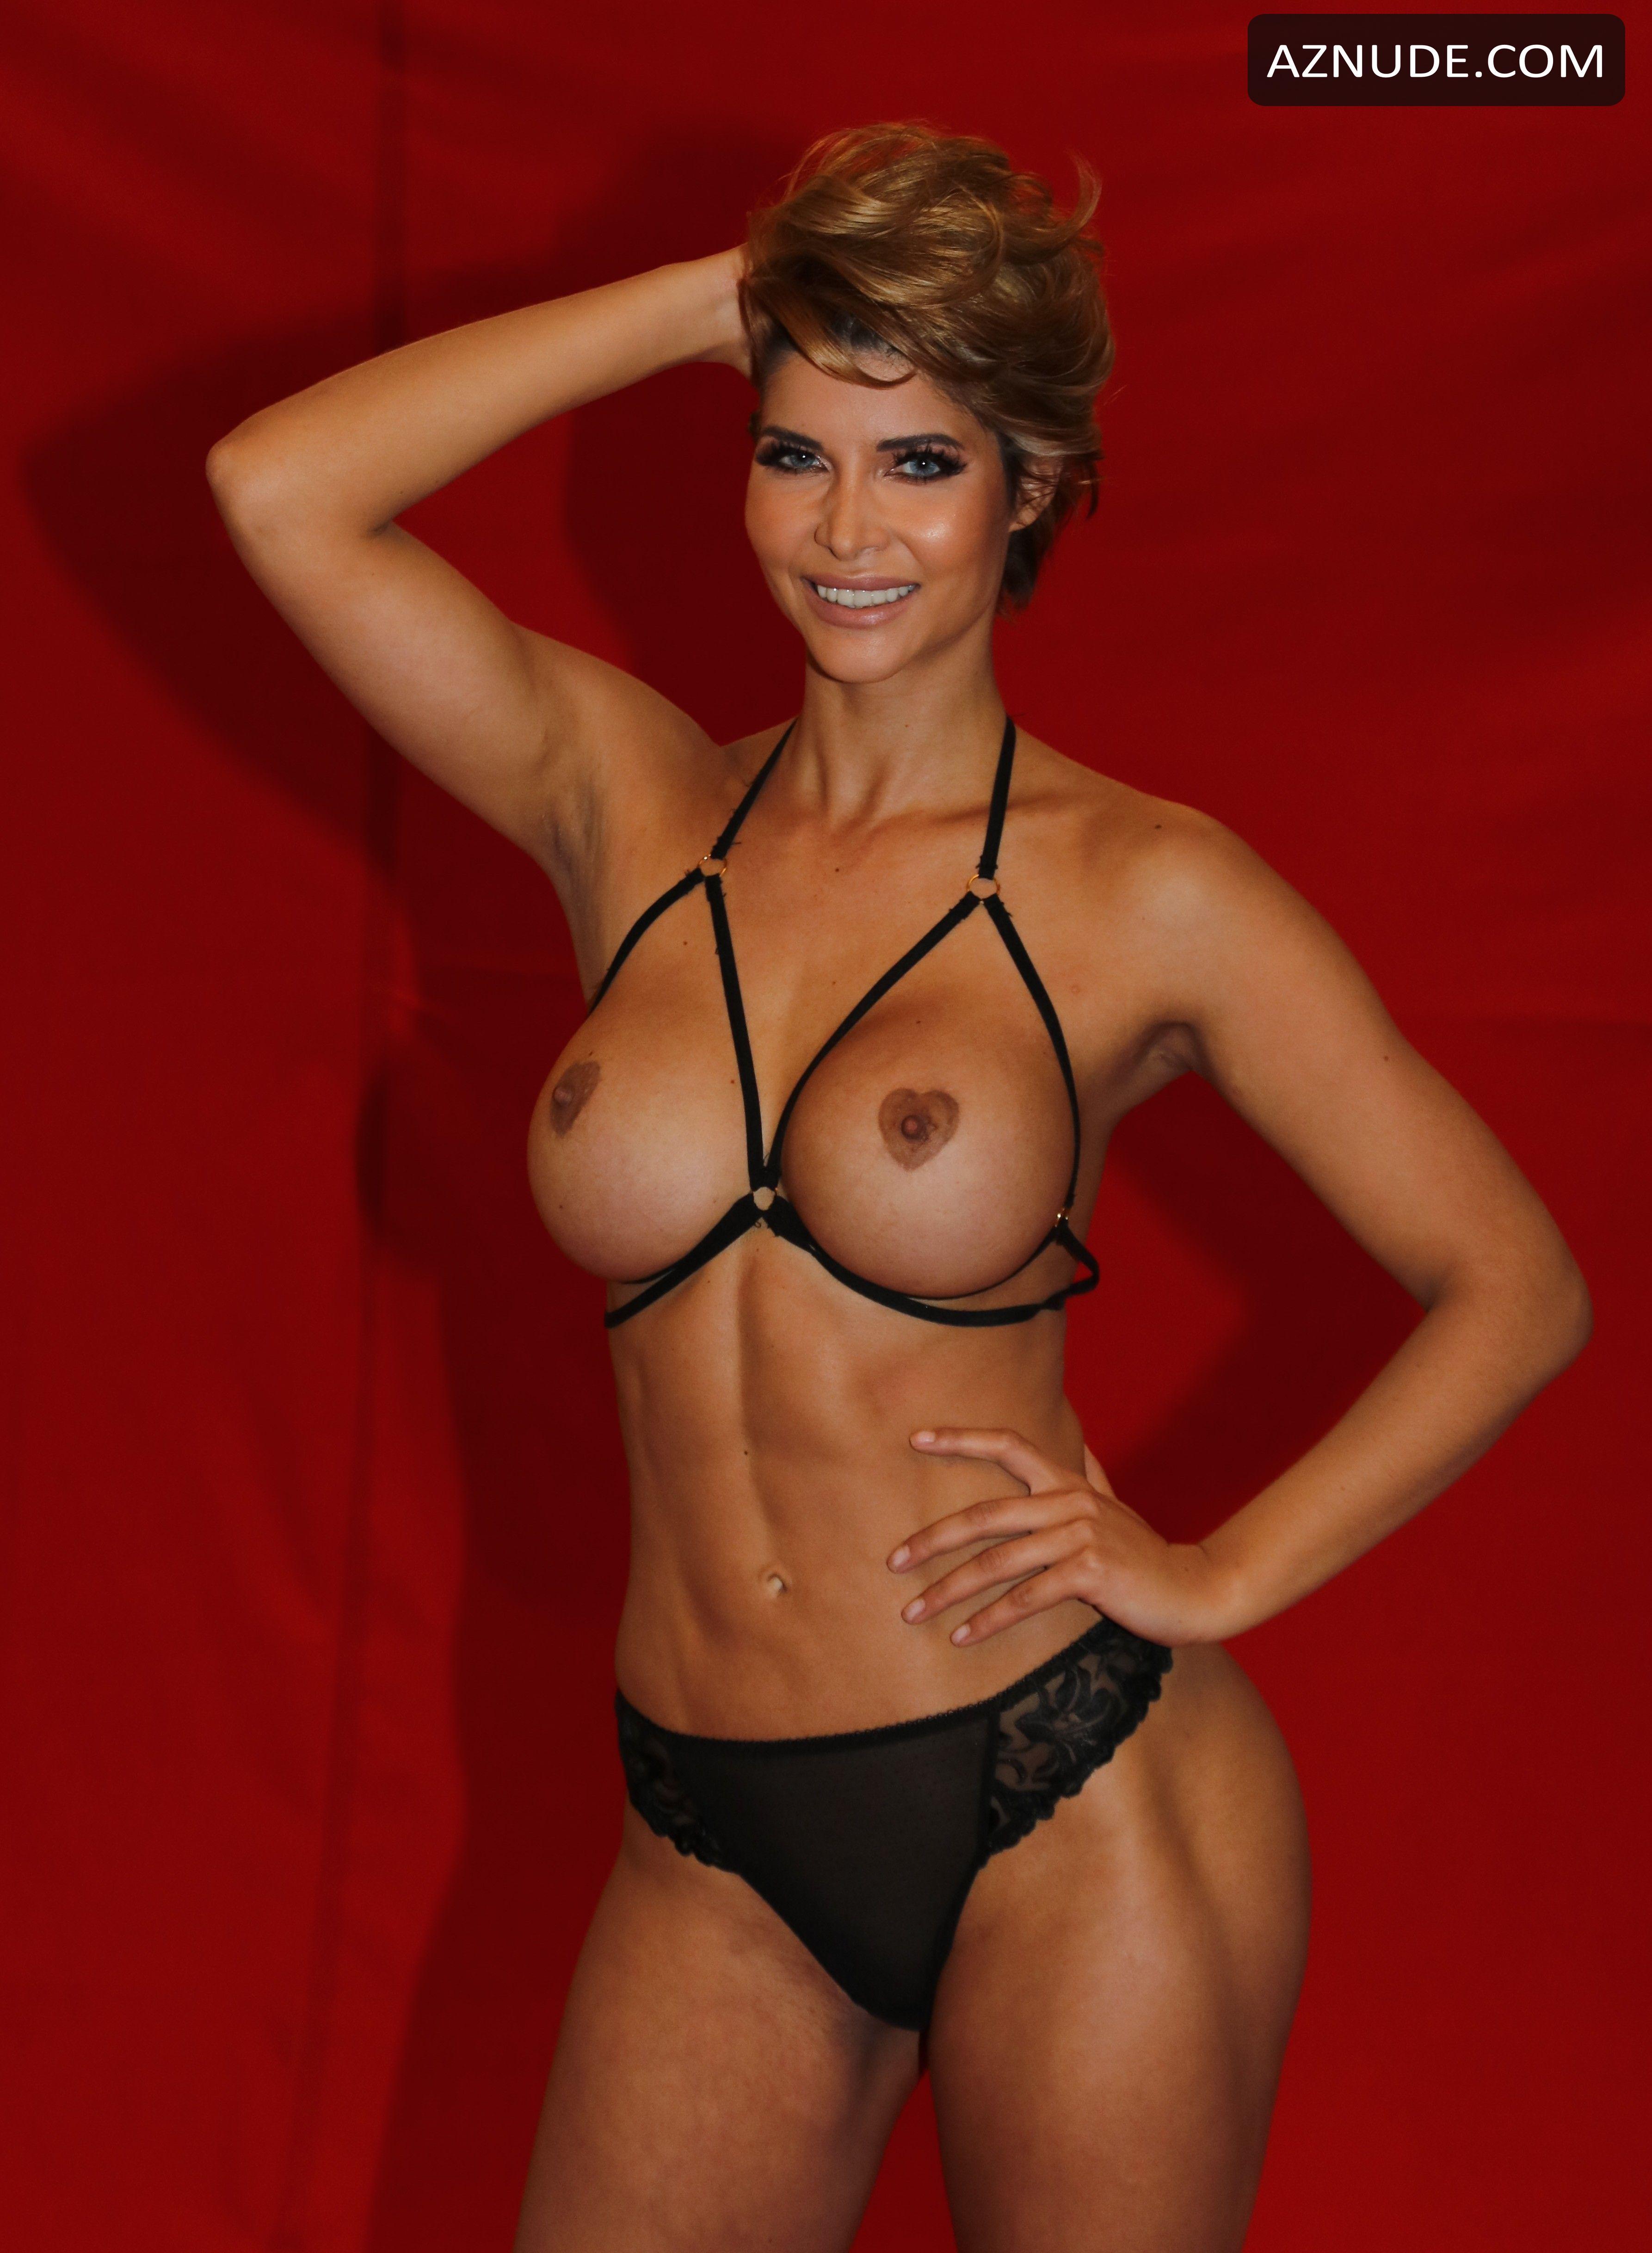 jasmin rühle nackt